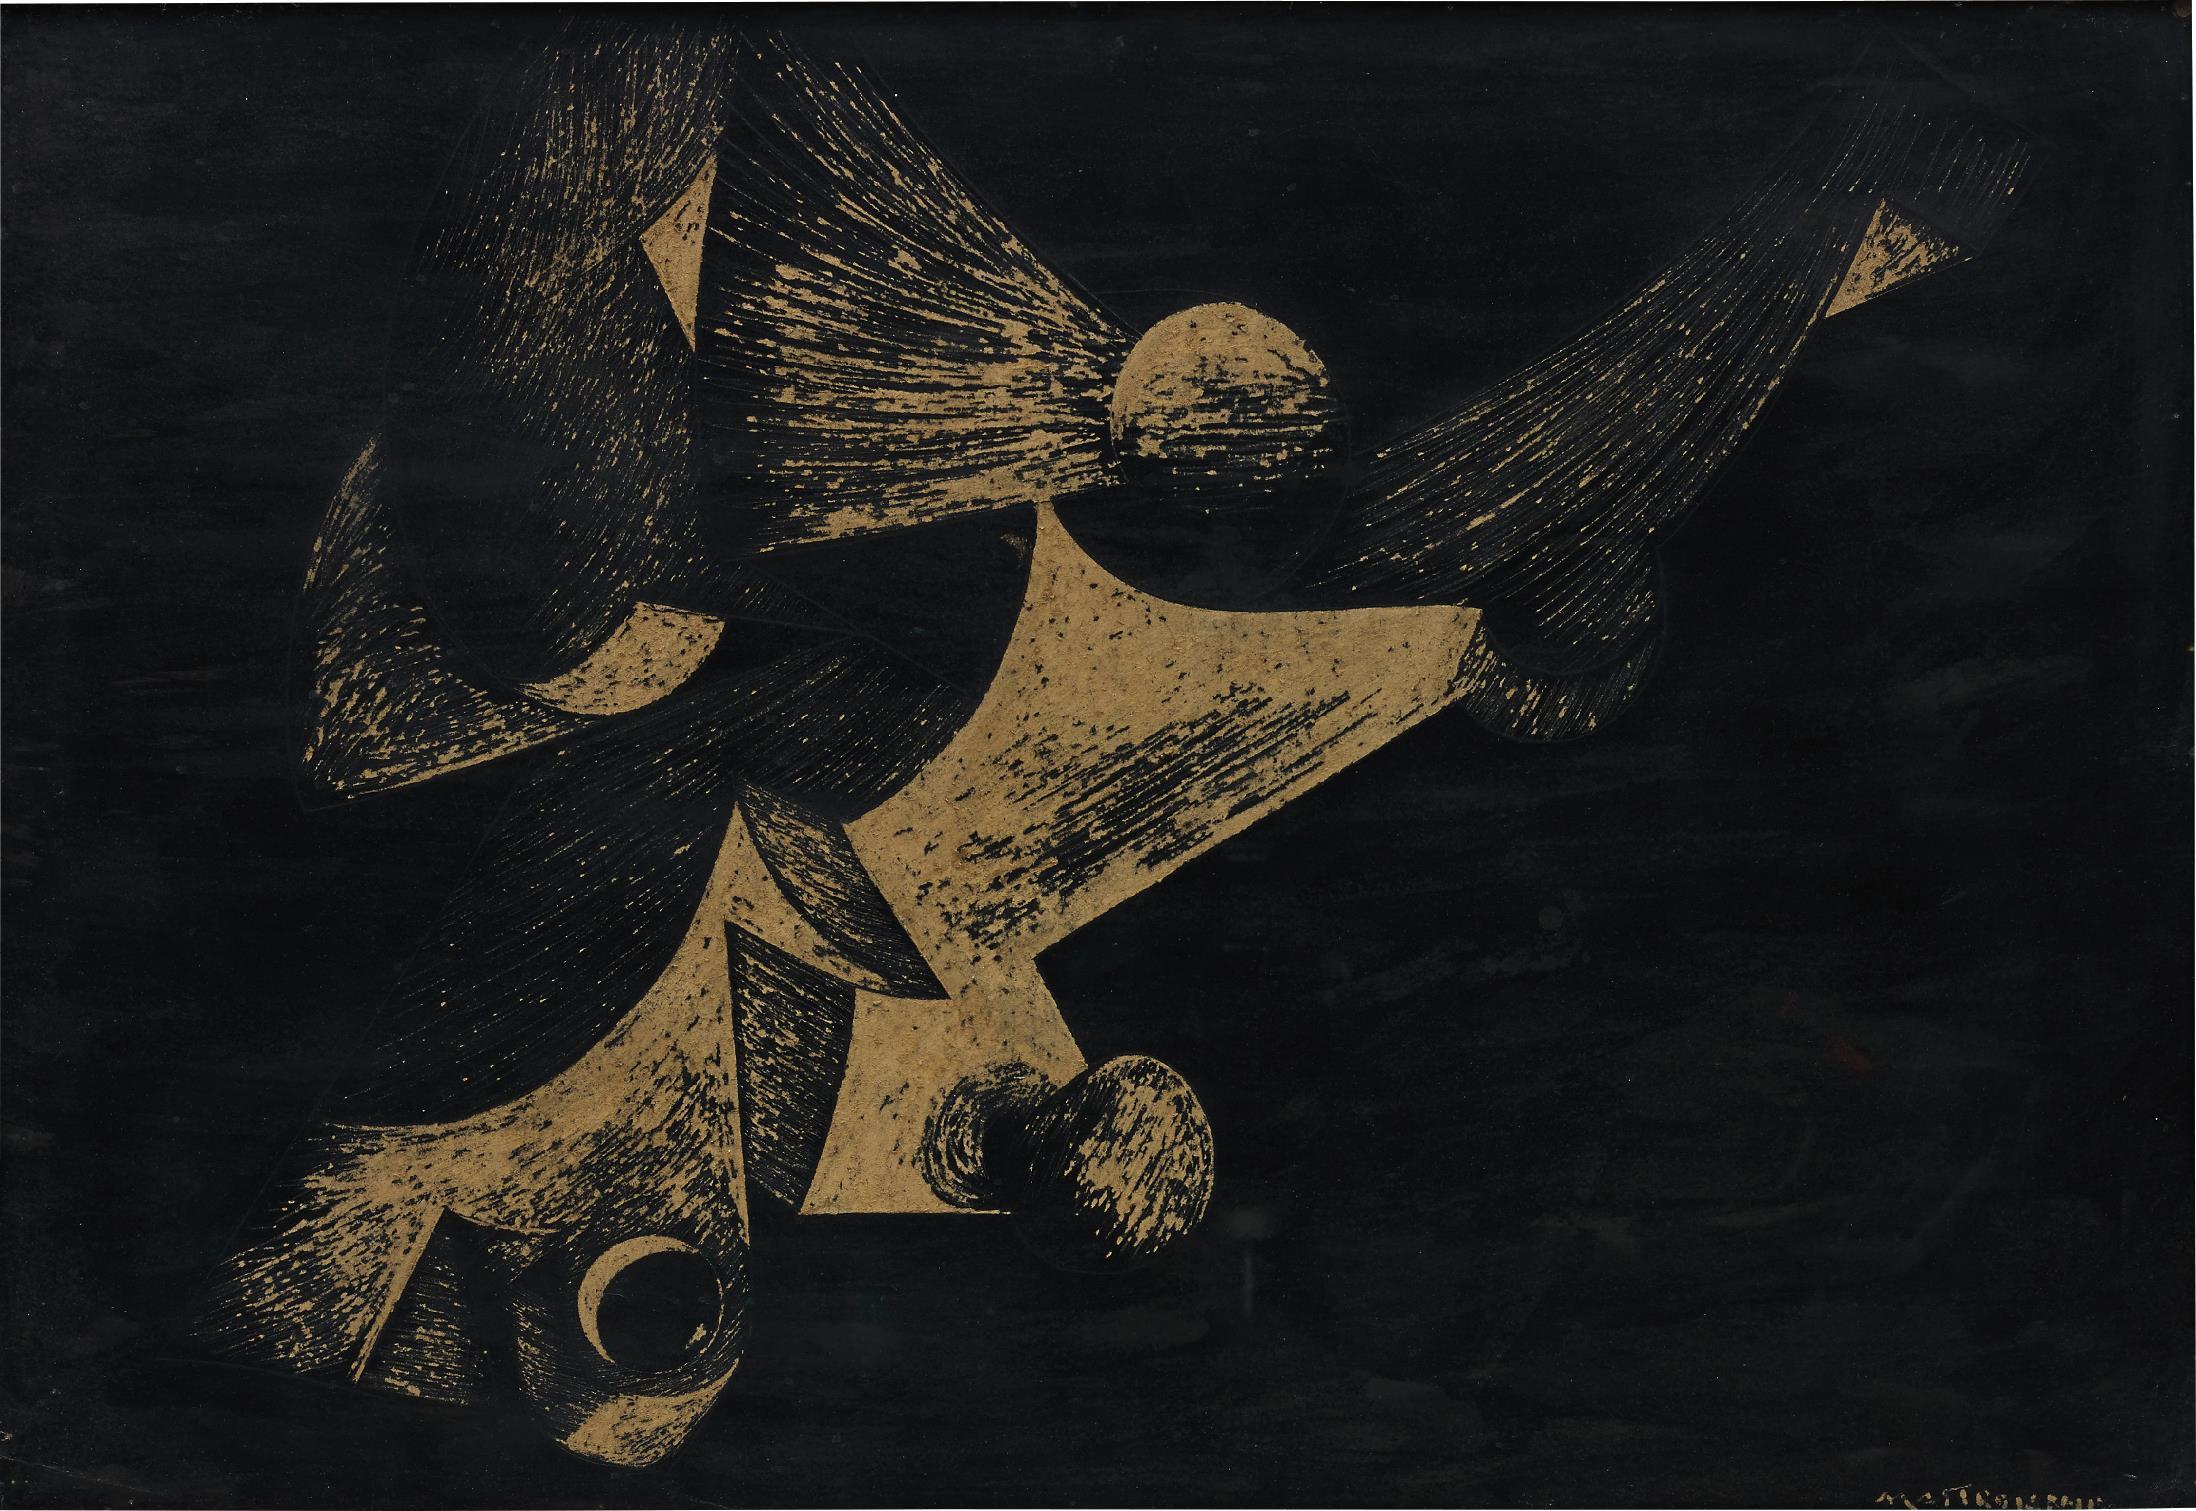 Umberto Mastroianni-Untitled-1960